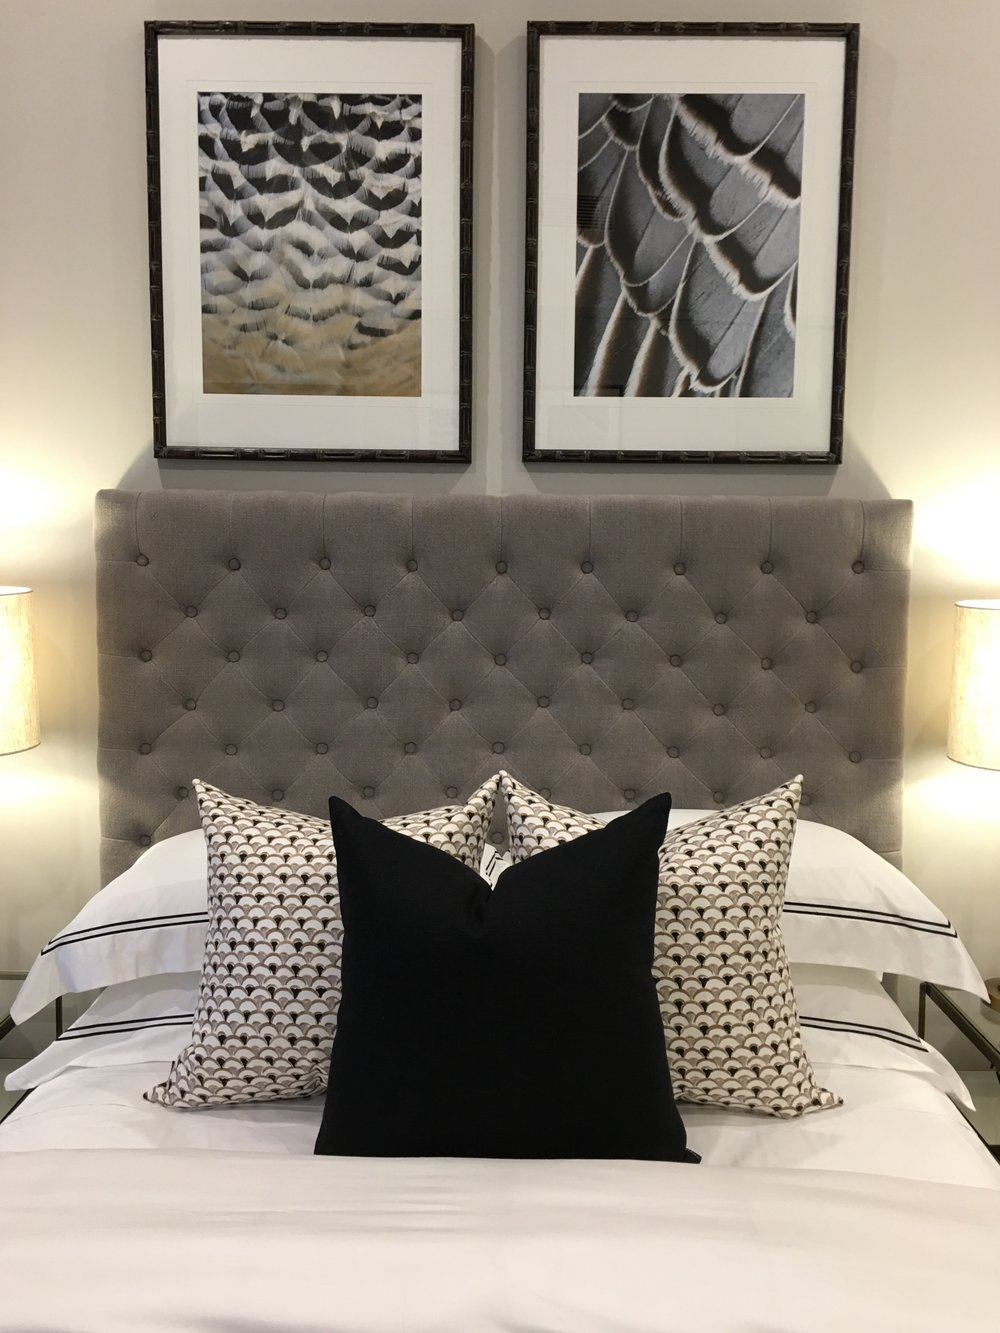 luxe_erskineville_bedroom_lifestyle_8.jpg